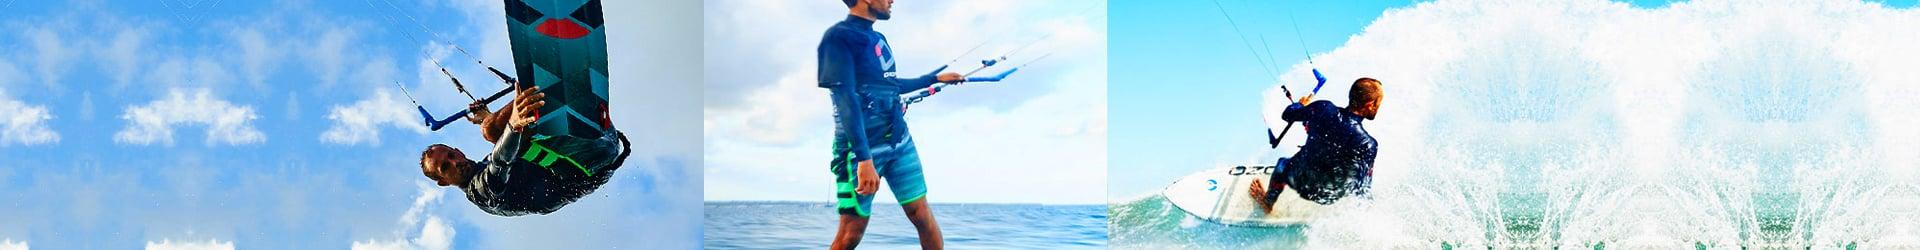 barras para kitesurf en chile